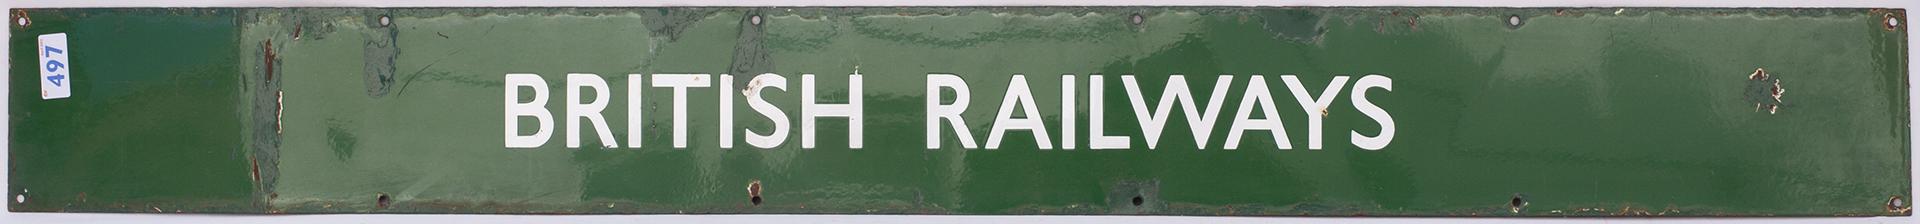 BR(S) Enamel poster board heading BRITISH RAILWAYS. Measures 52.5 in x 5.75 in.